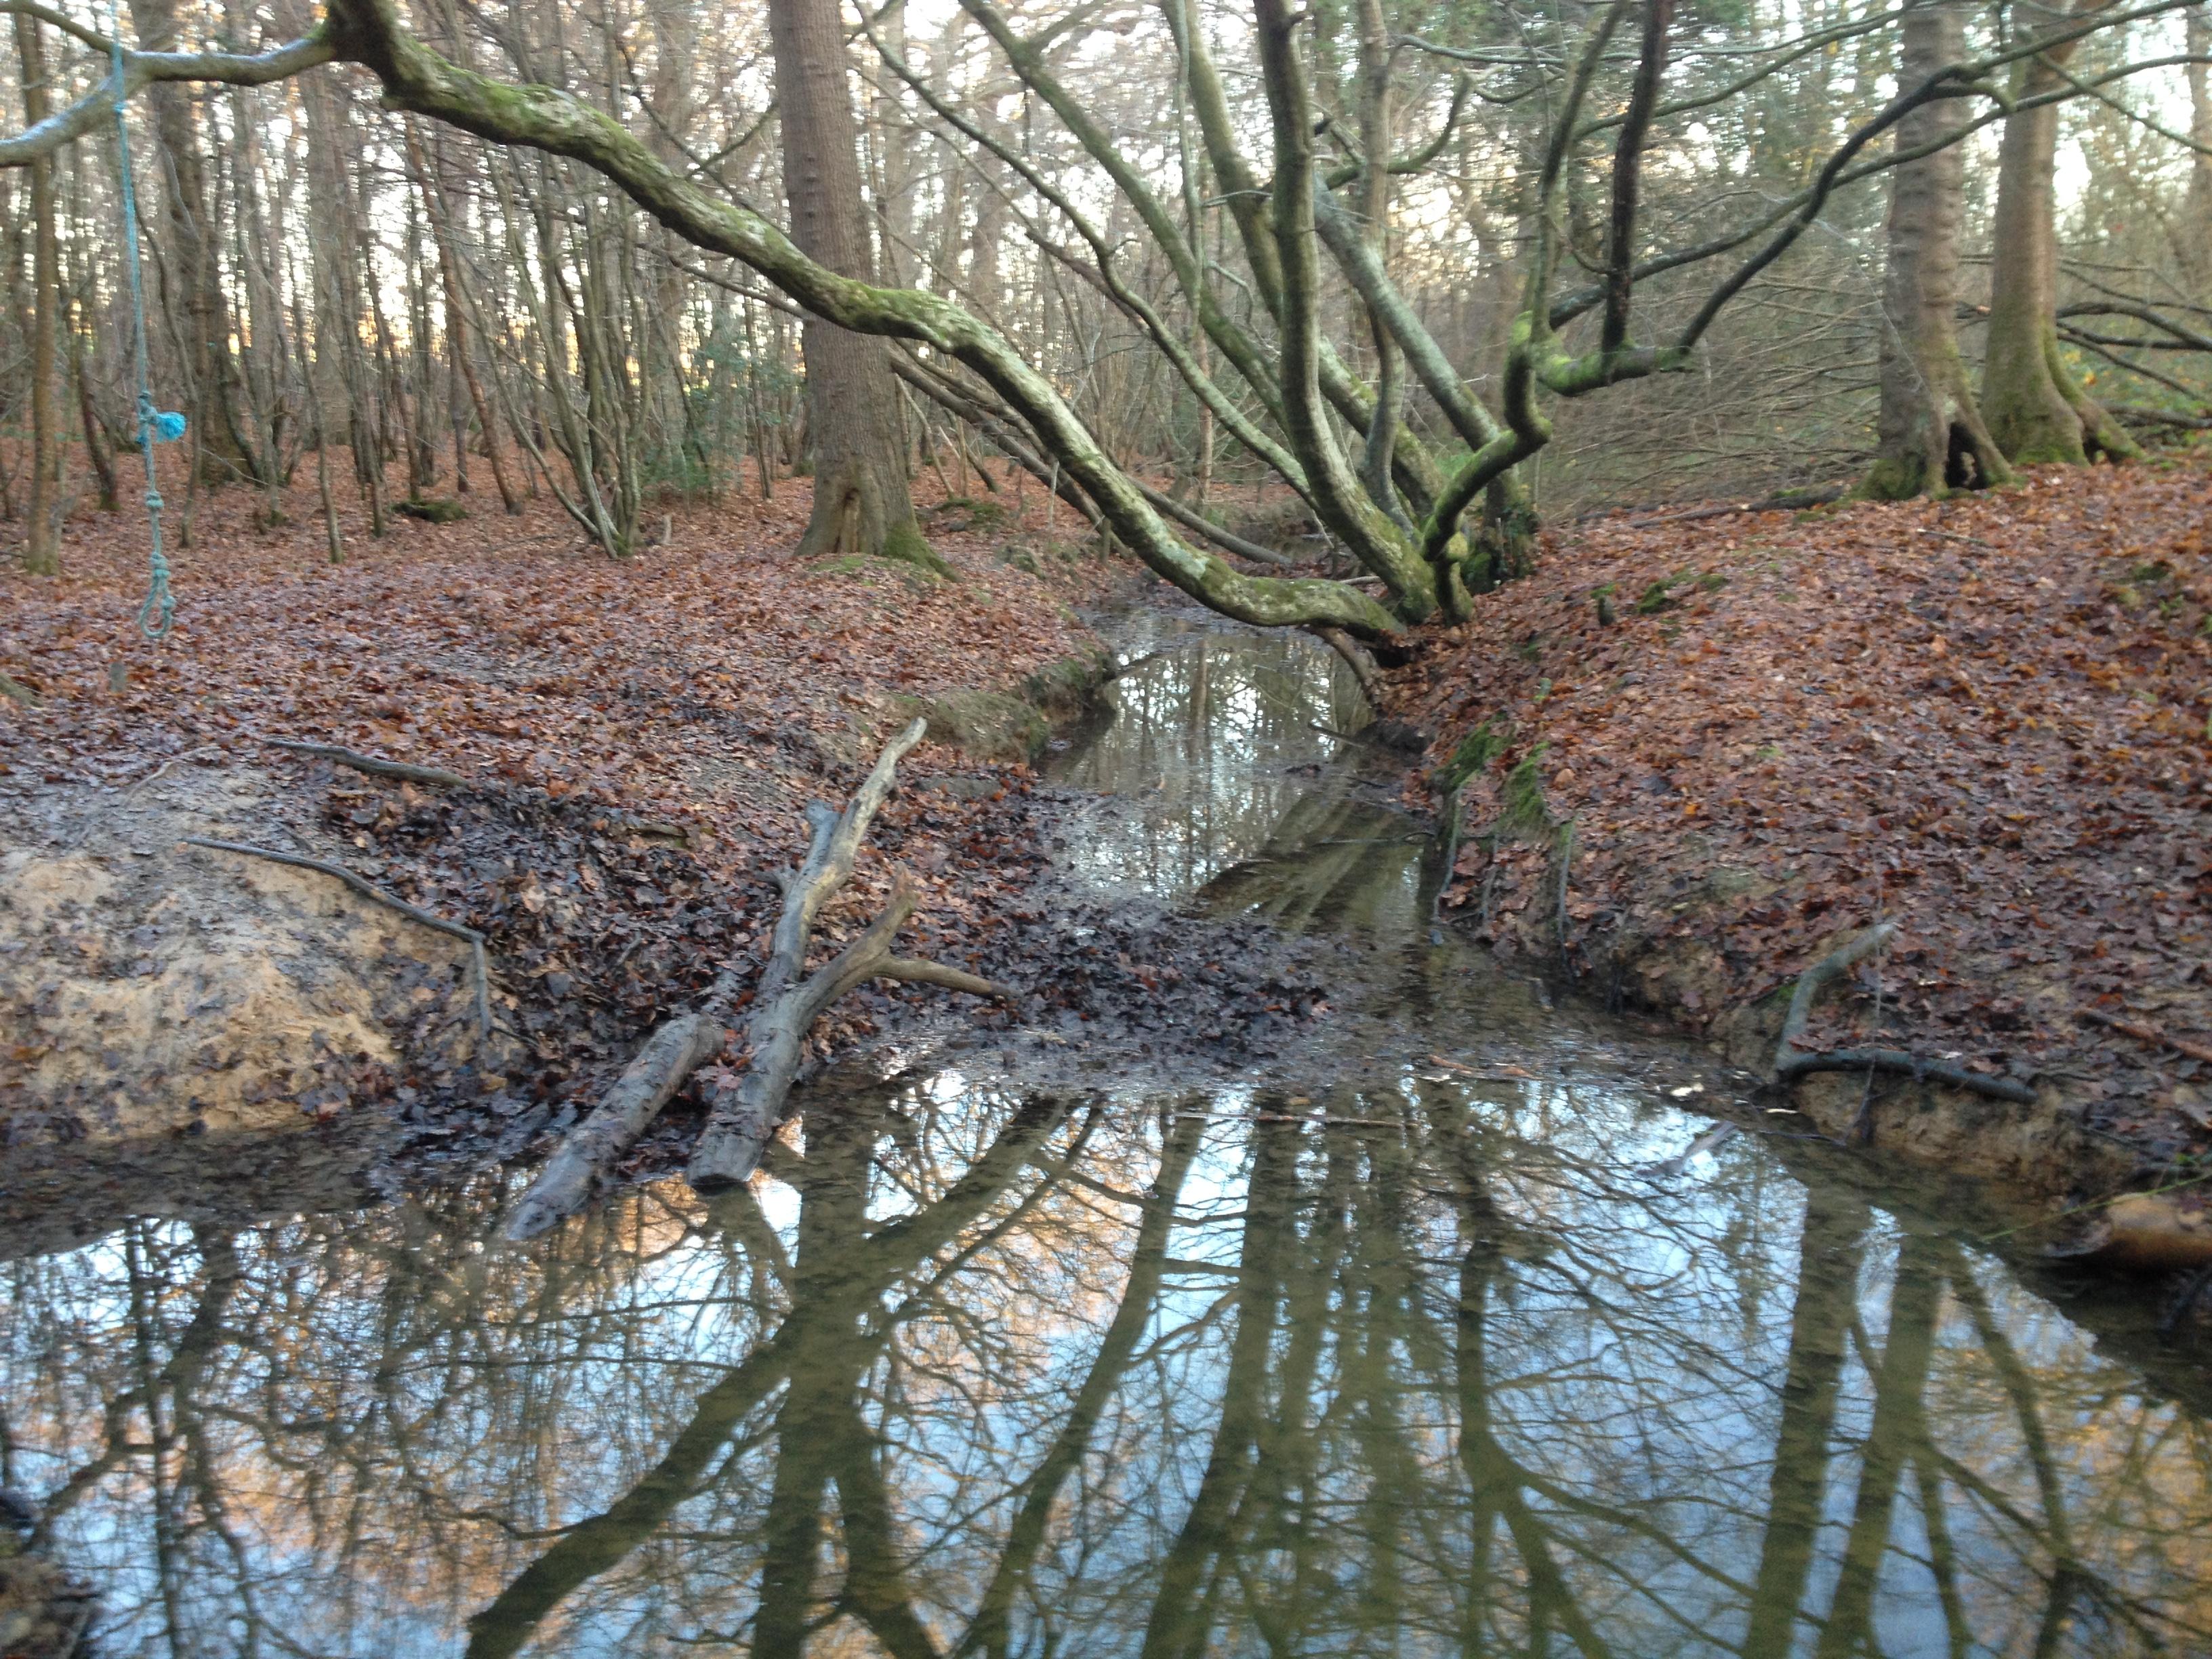 Reflections RSPB Blean Woods (2017) photo